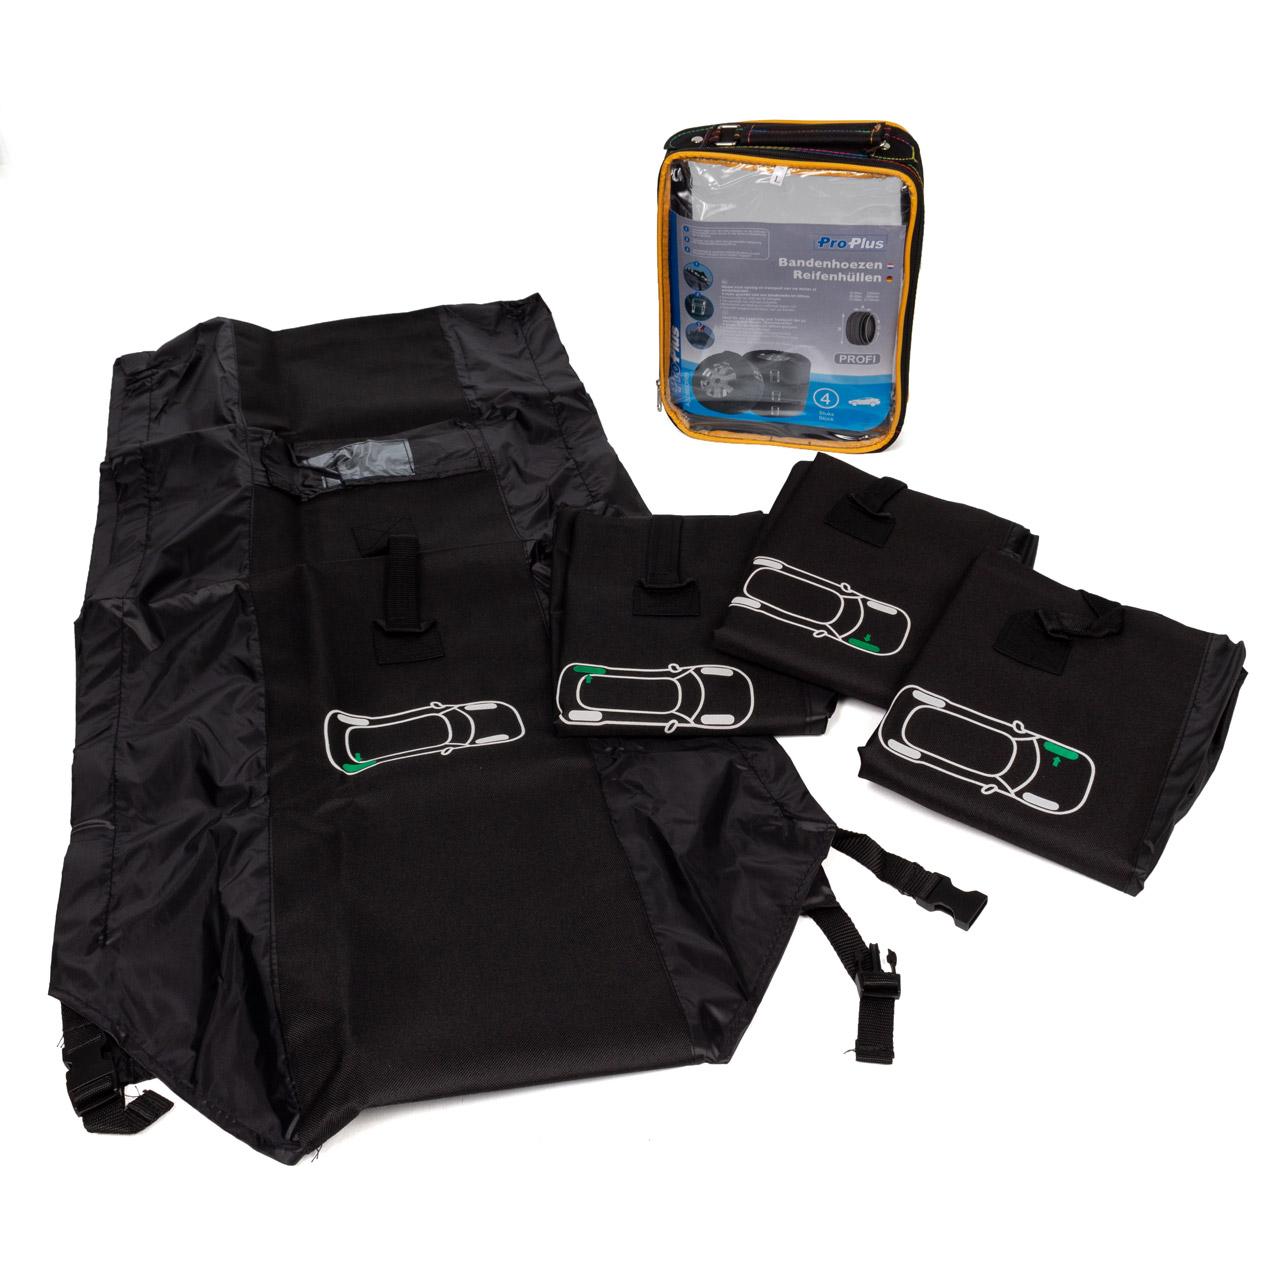 "PROPLUS Reifenhüllen Reifentaschen Schutzhülle PROFI Set 4 Stück Set 13""-18"" bis 240mm"